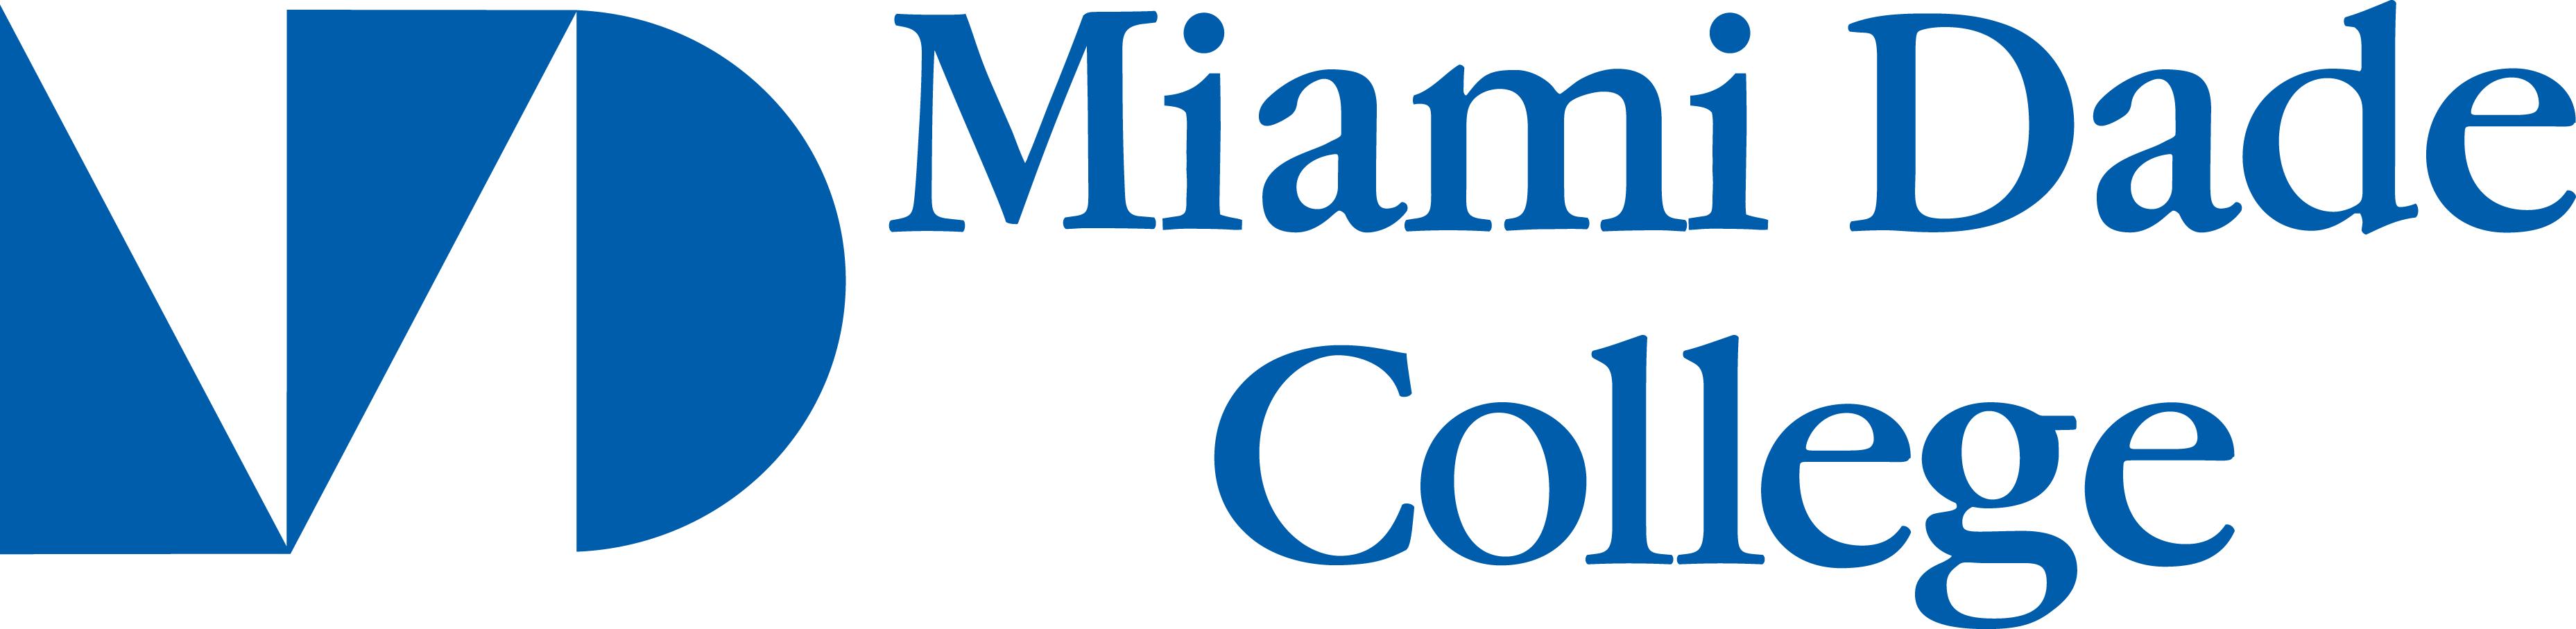 Miami-Dade-College-logo-page